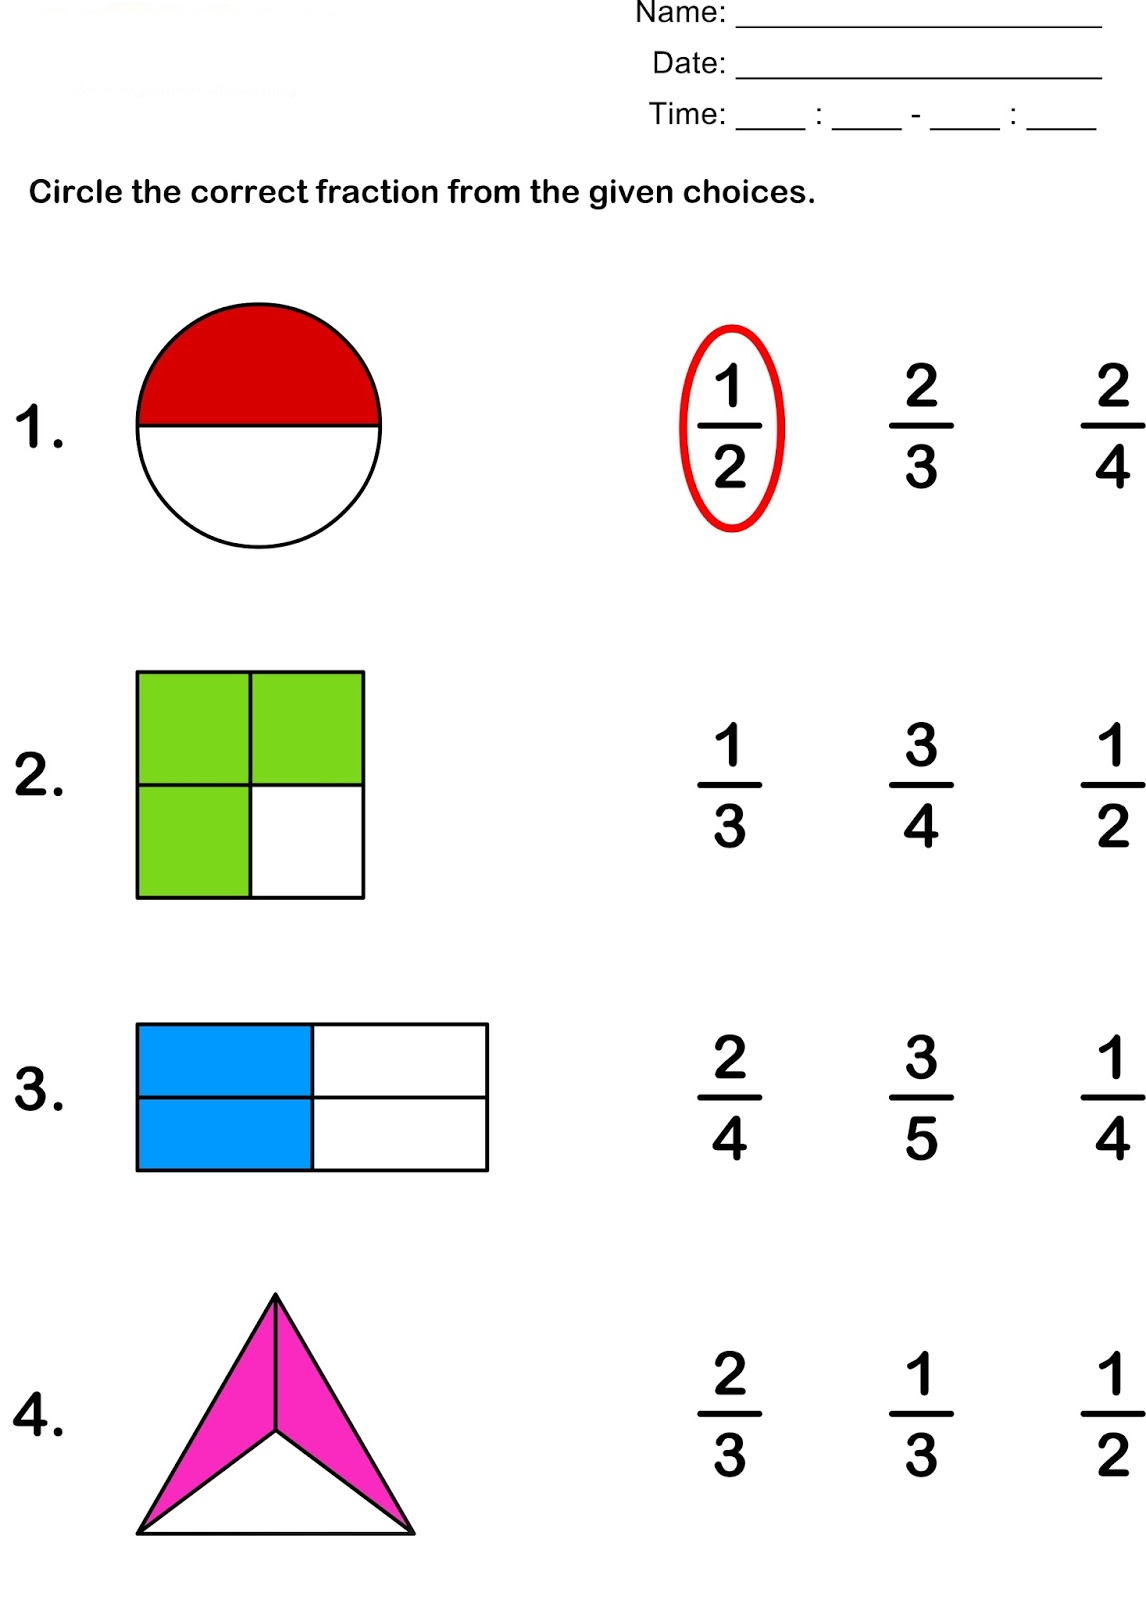 medium resolution of Worksheet For Grade 5 Araling Panlipunan   Printable Worksheets and  Activities for Teachers